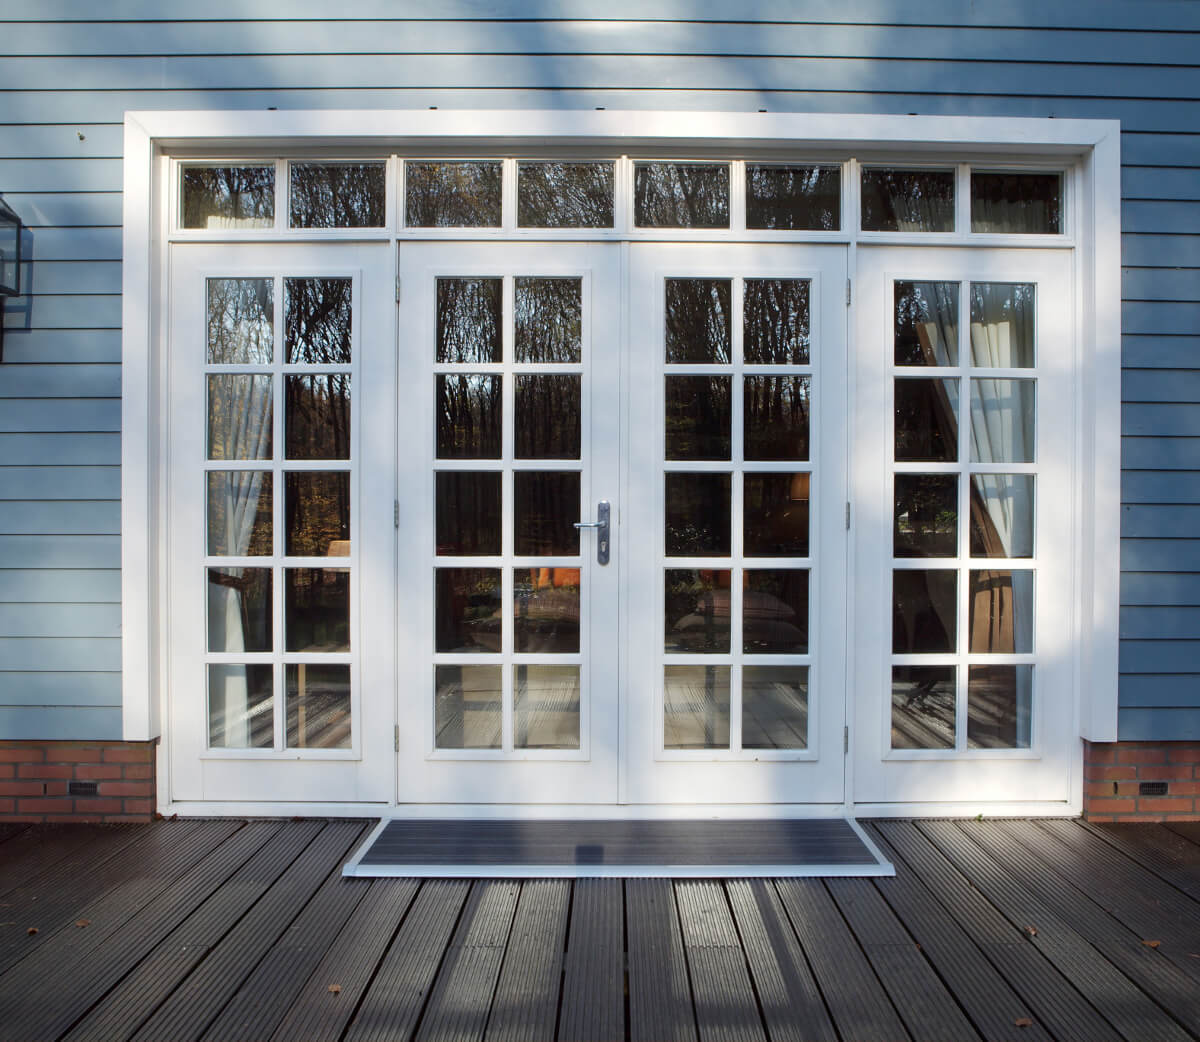 Sfeerimpressie RiZZ deurmat The New Standard zilver 1.jpg